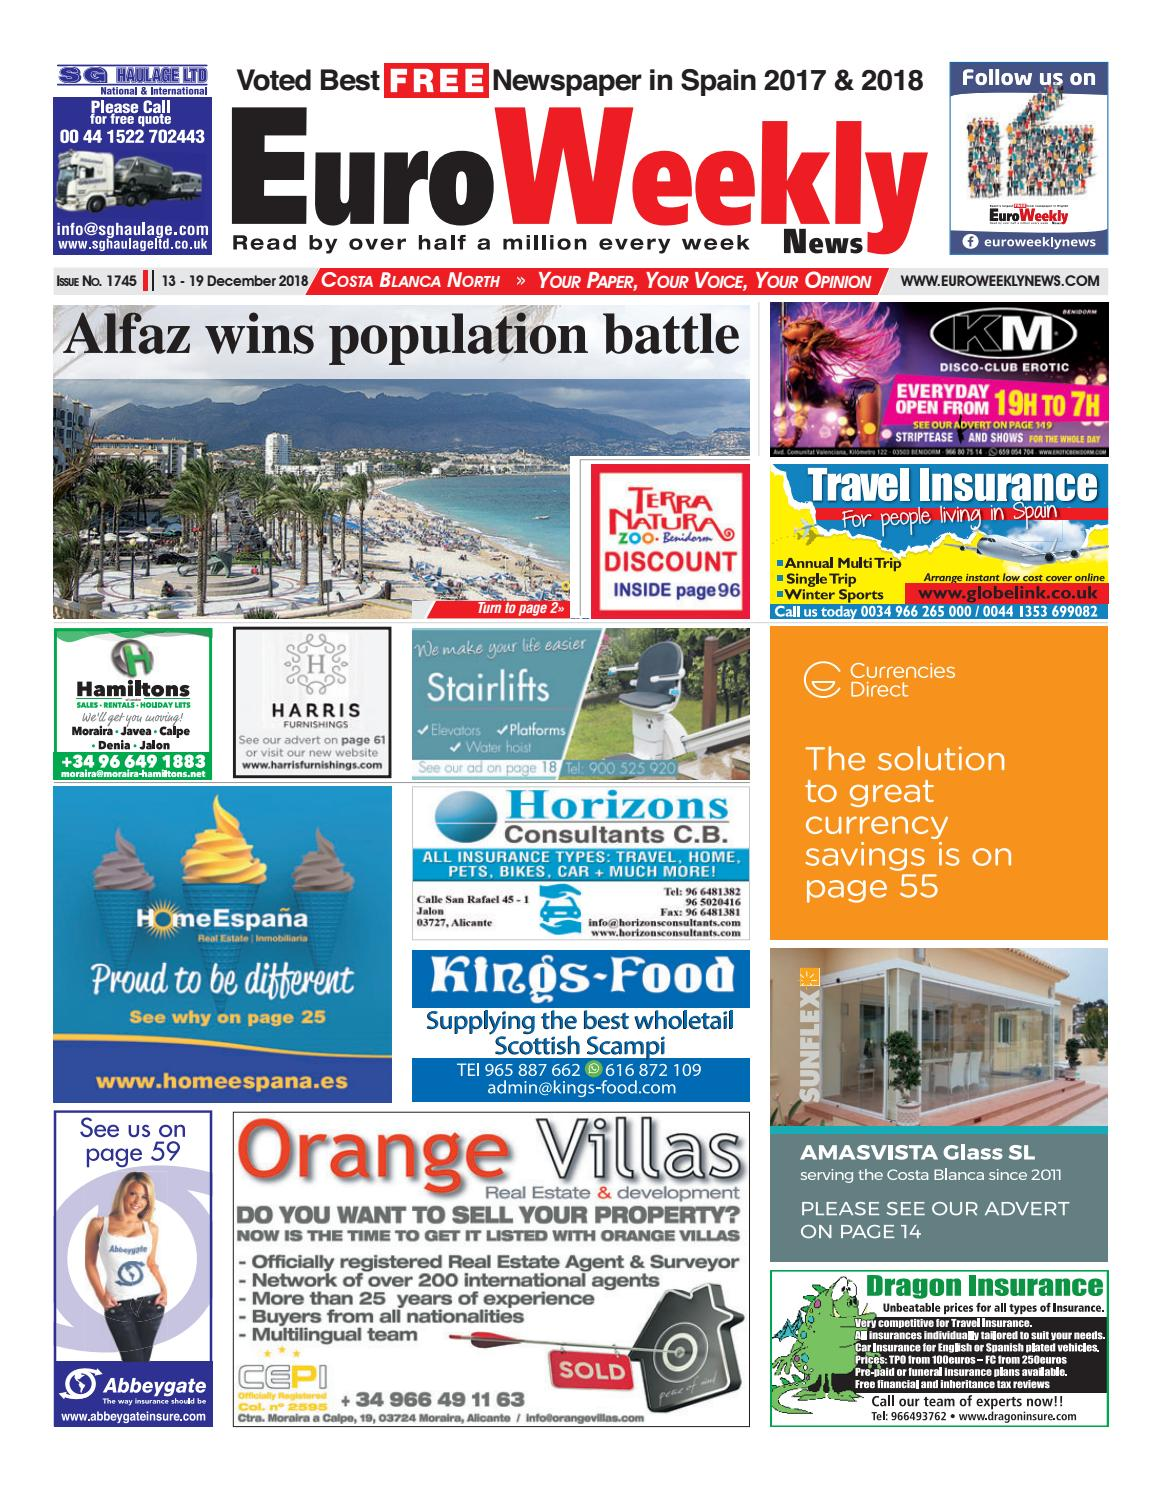 9274857db Euro Weekly News - Costa Blanca North 13-19 December 2018 Issue 1745 ...